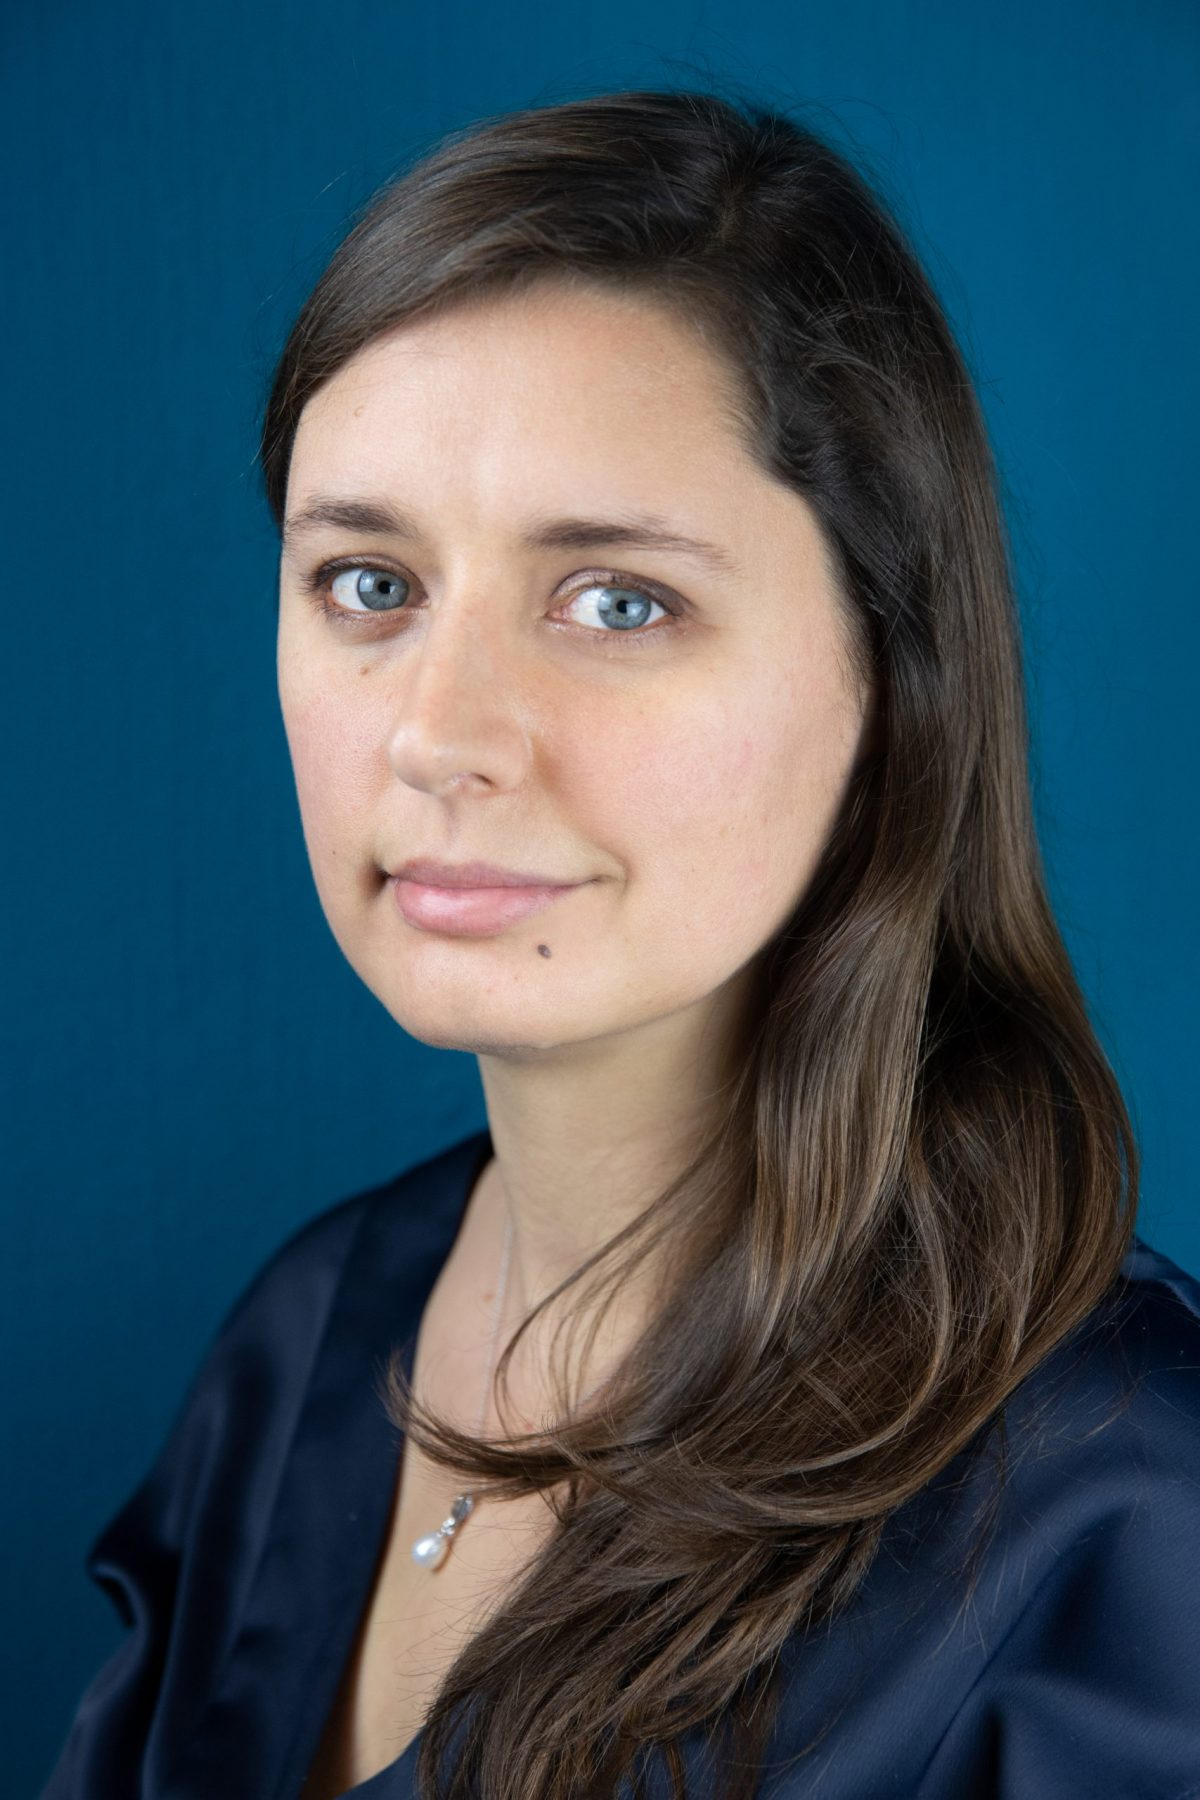 Katharina Nocun, Foto: Miriam Juschkat